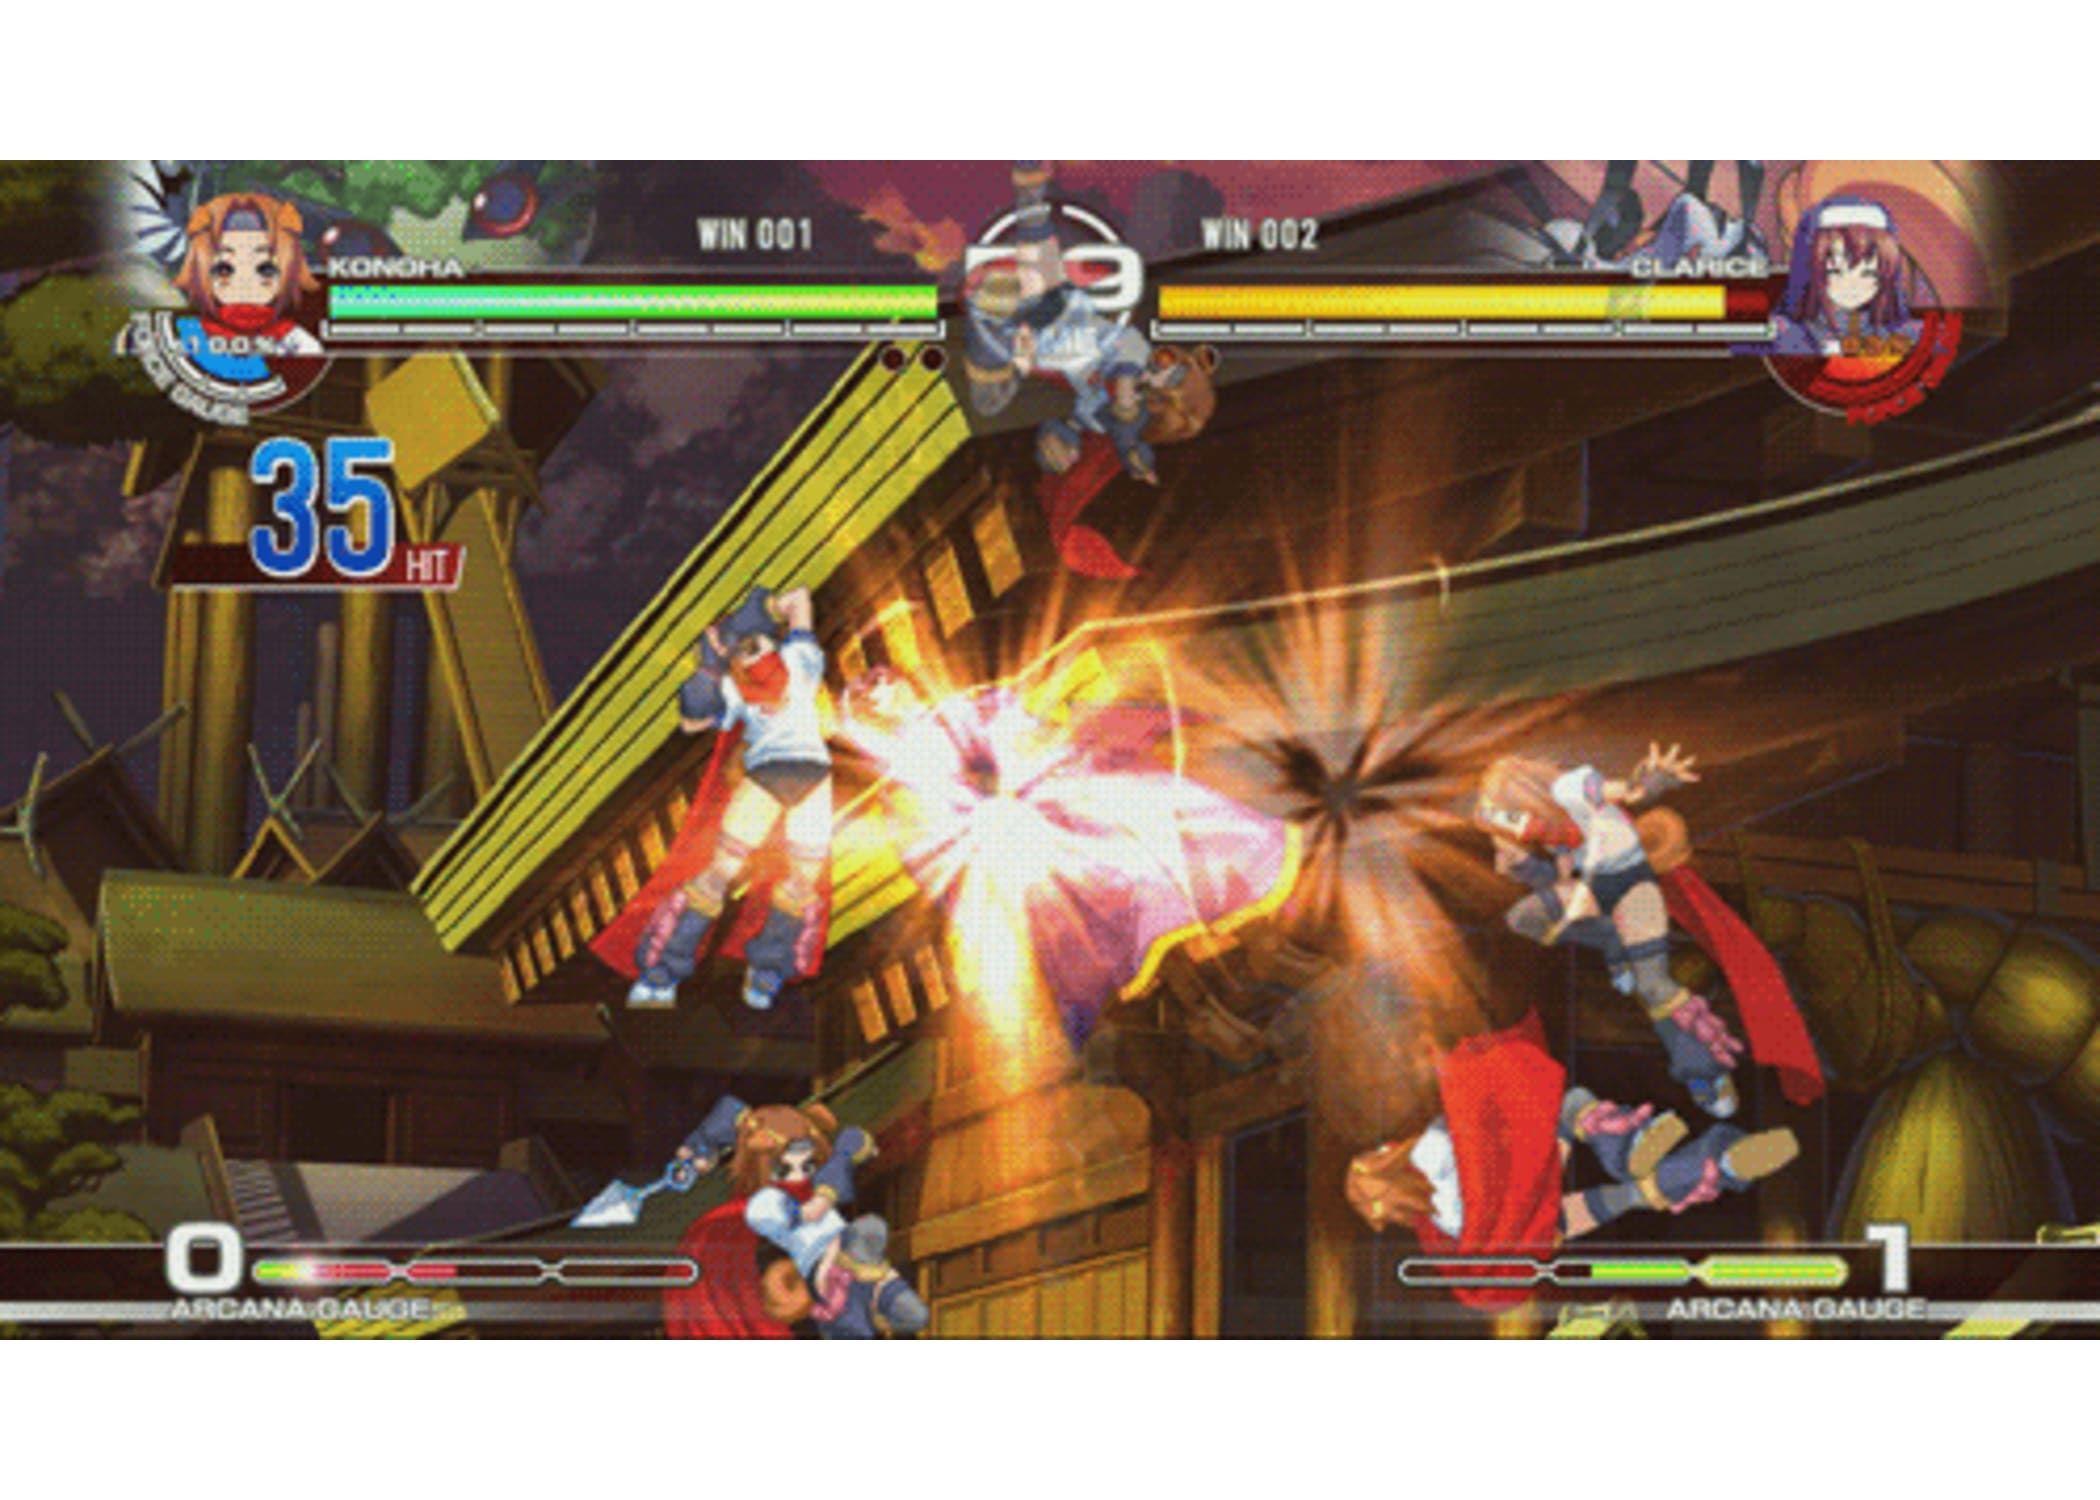 Buy arcana heart 3 on xbox 360 game affiliate